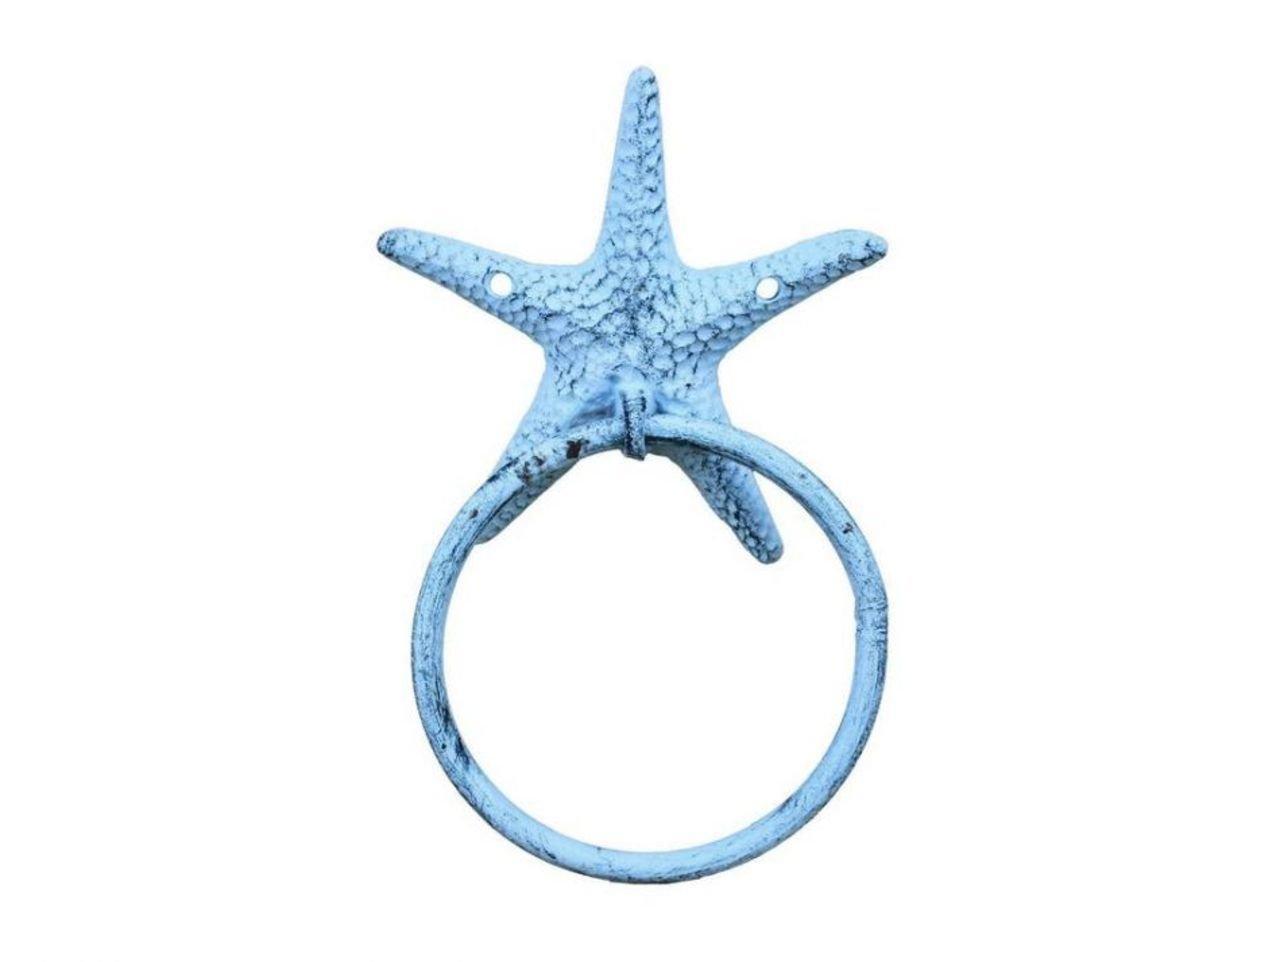 Rustic Dark Blue Whitewashed Cast Iron Starfish Towel Holder 8.5 Inch Starfish Decoration Sea Home